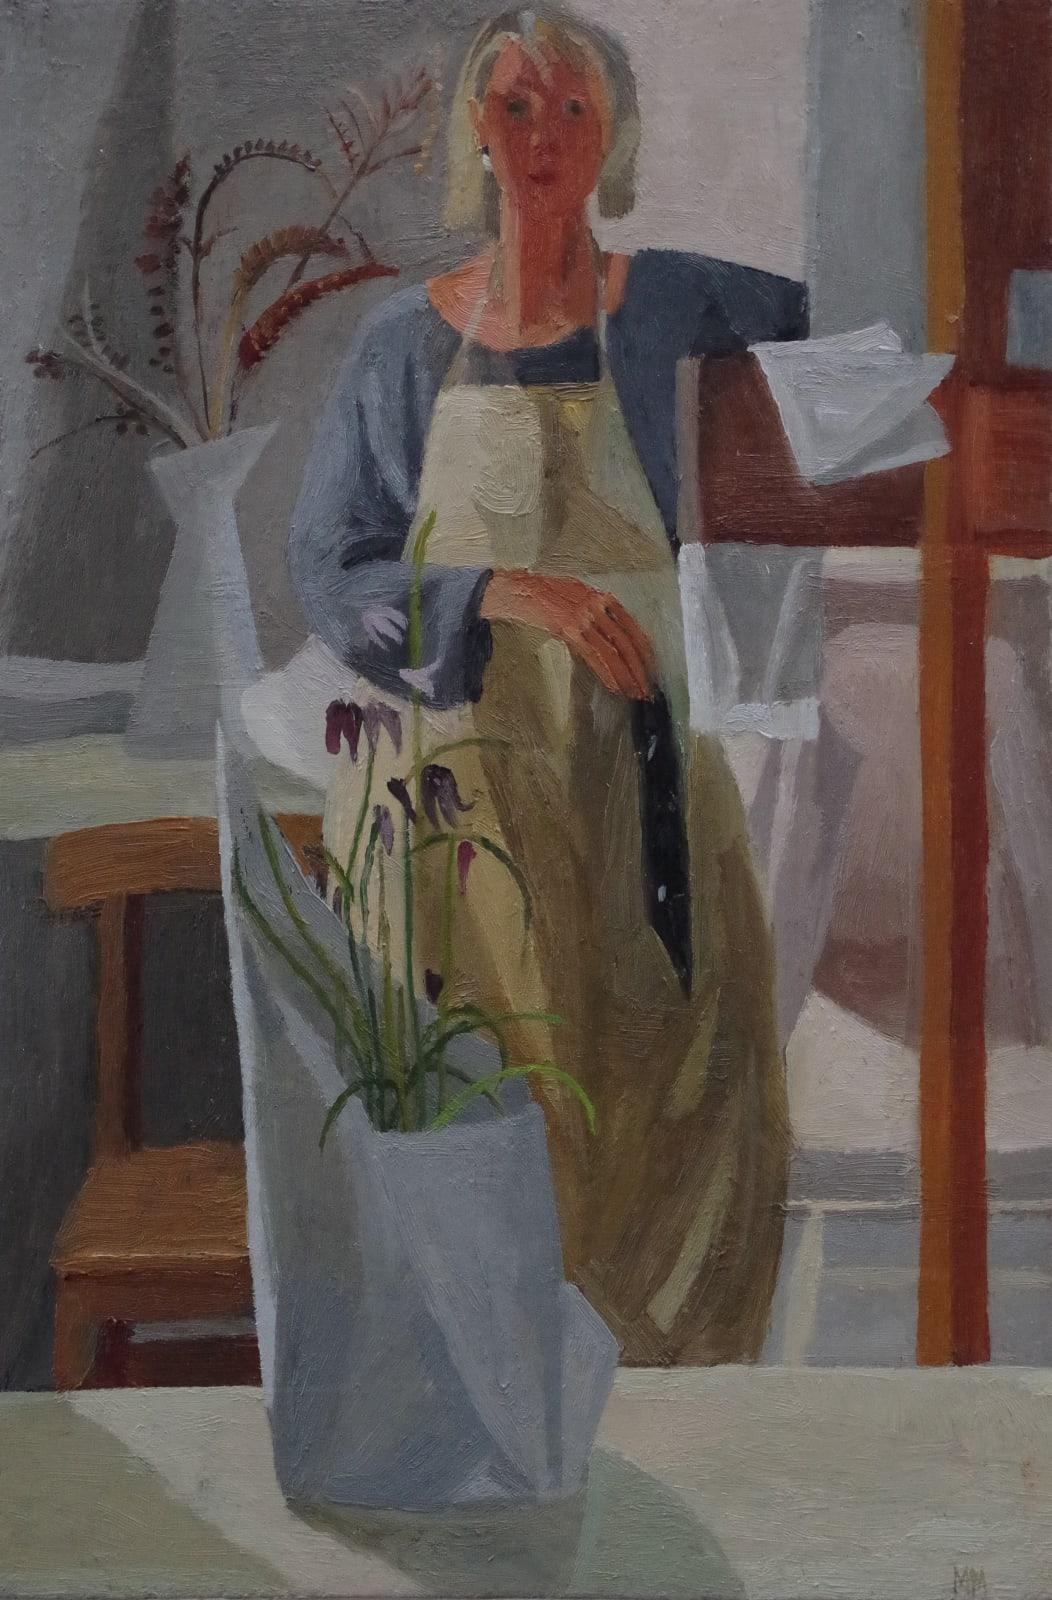 Mary Mabbutt, Self Portrait Holding Black Paint Rag